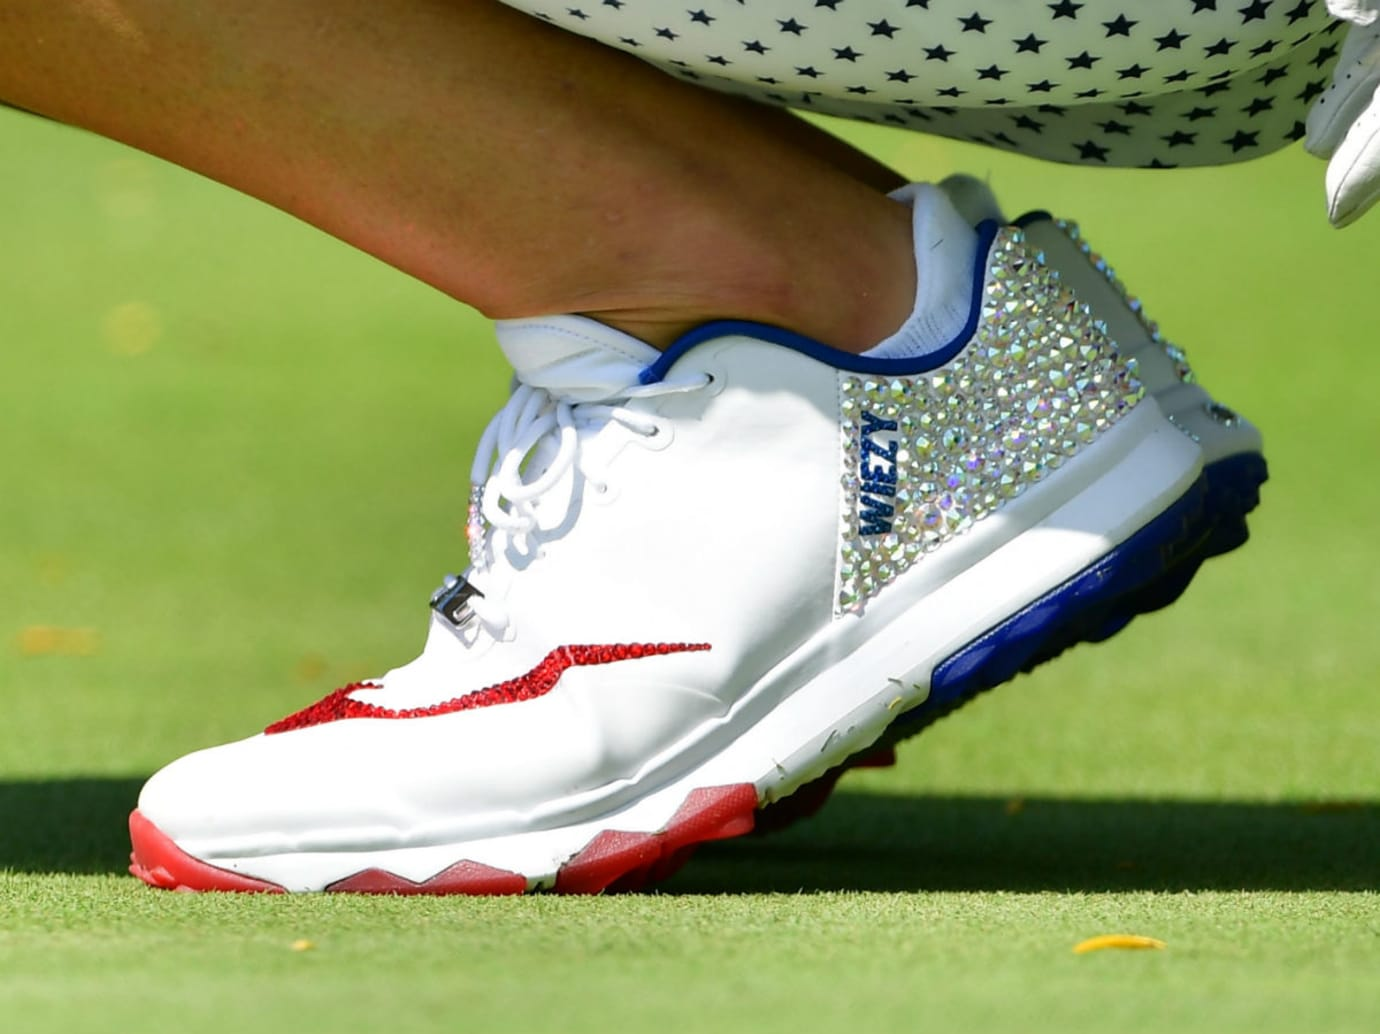 Michelle Wie Nike FI Flex Swarovski Crystal Golf Shoes